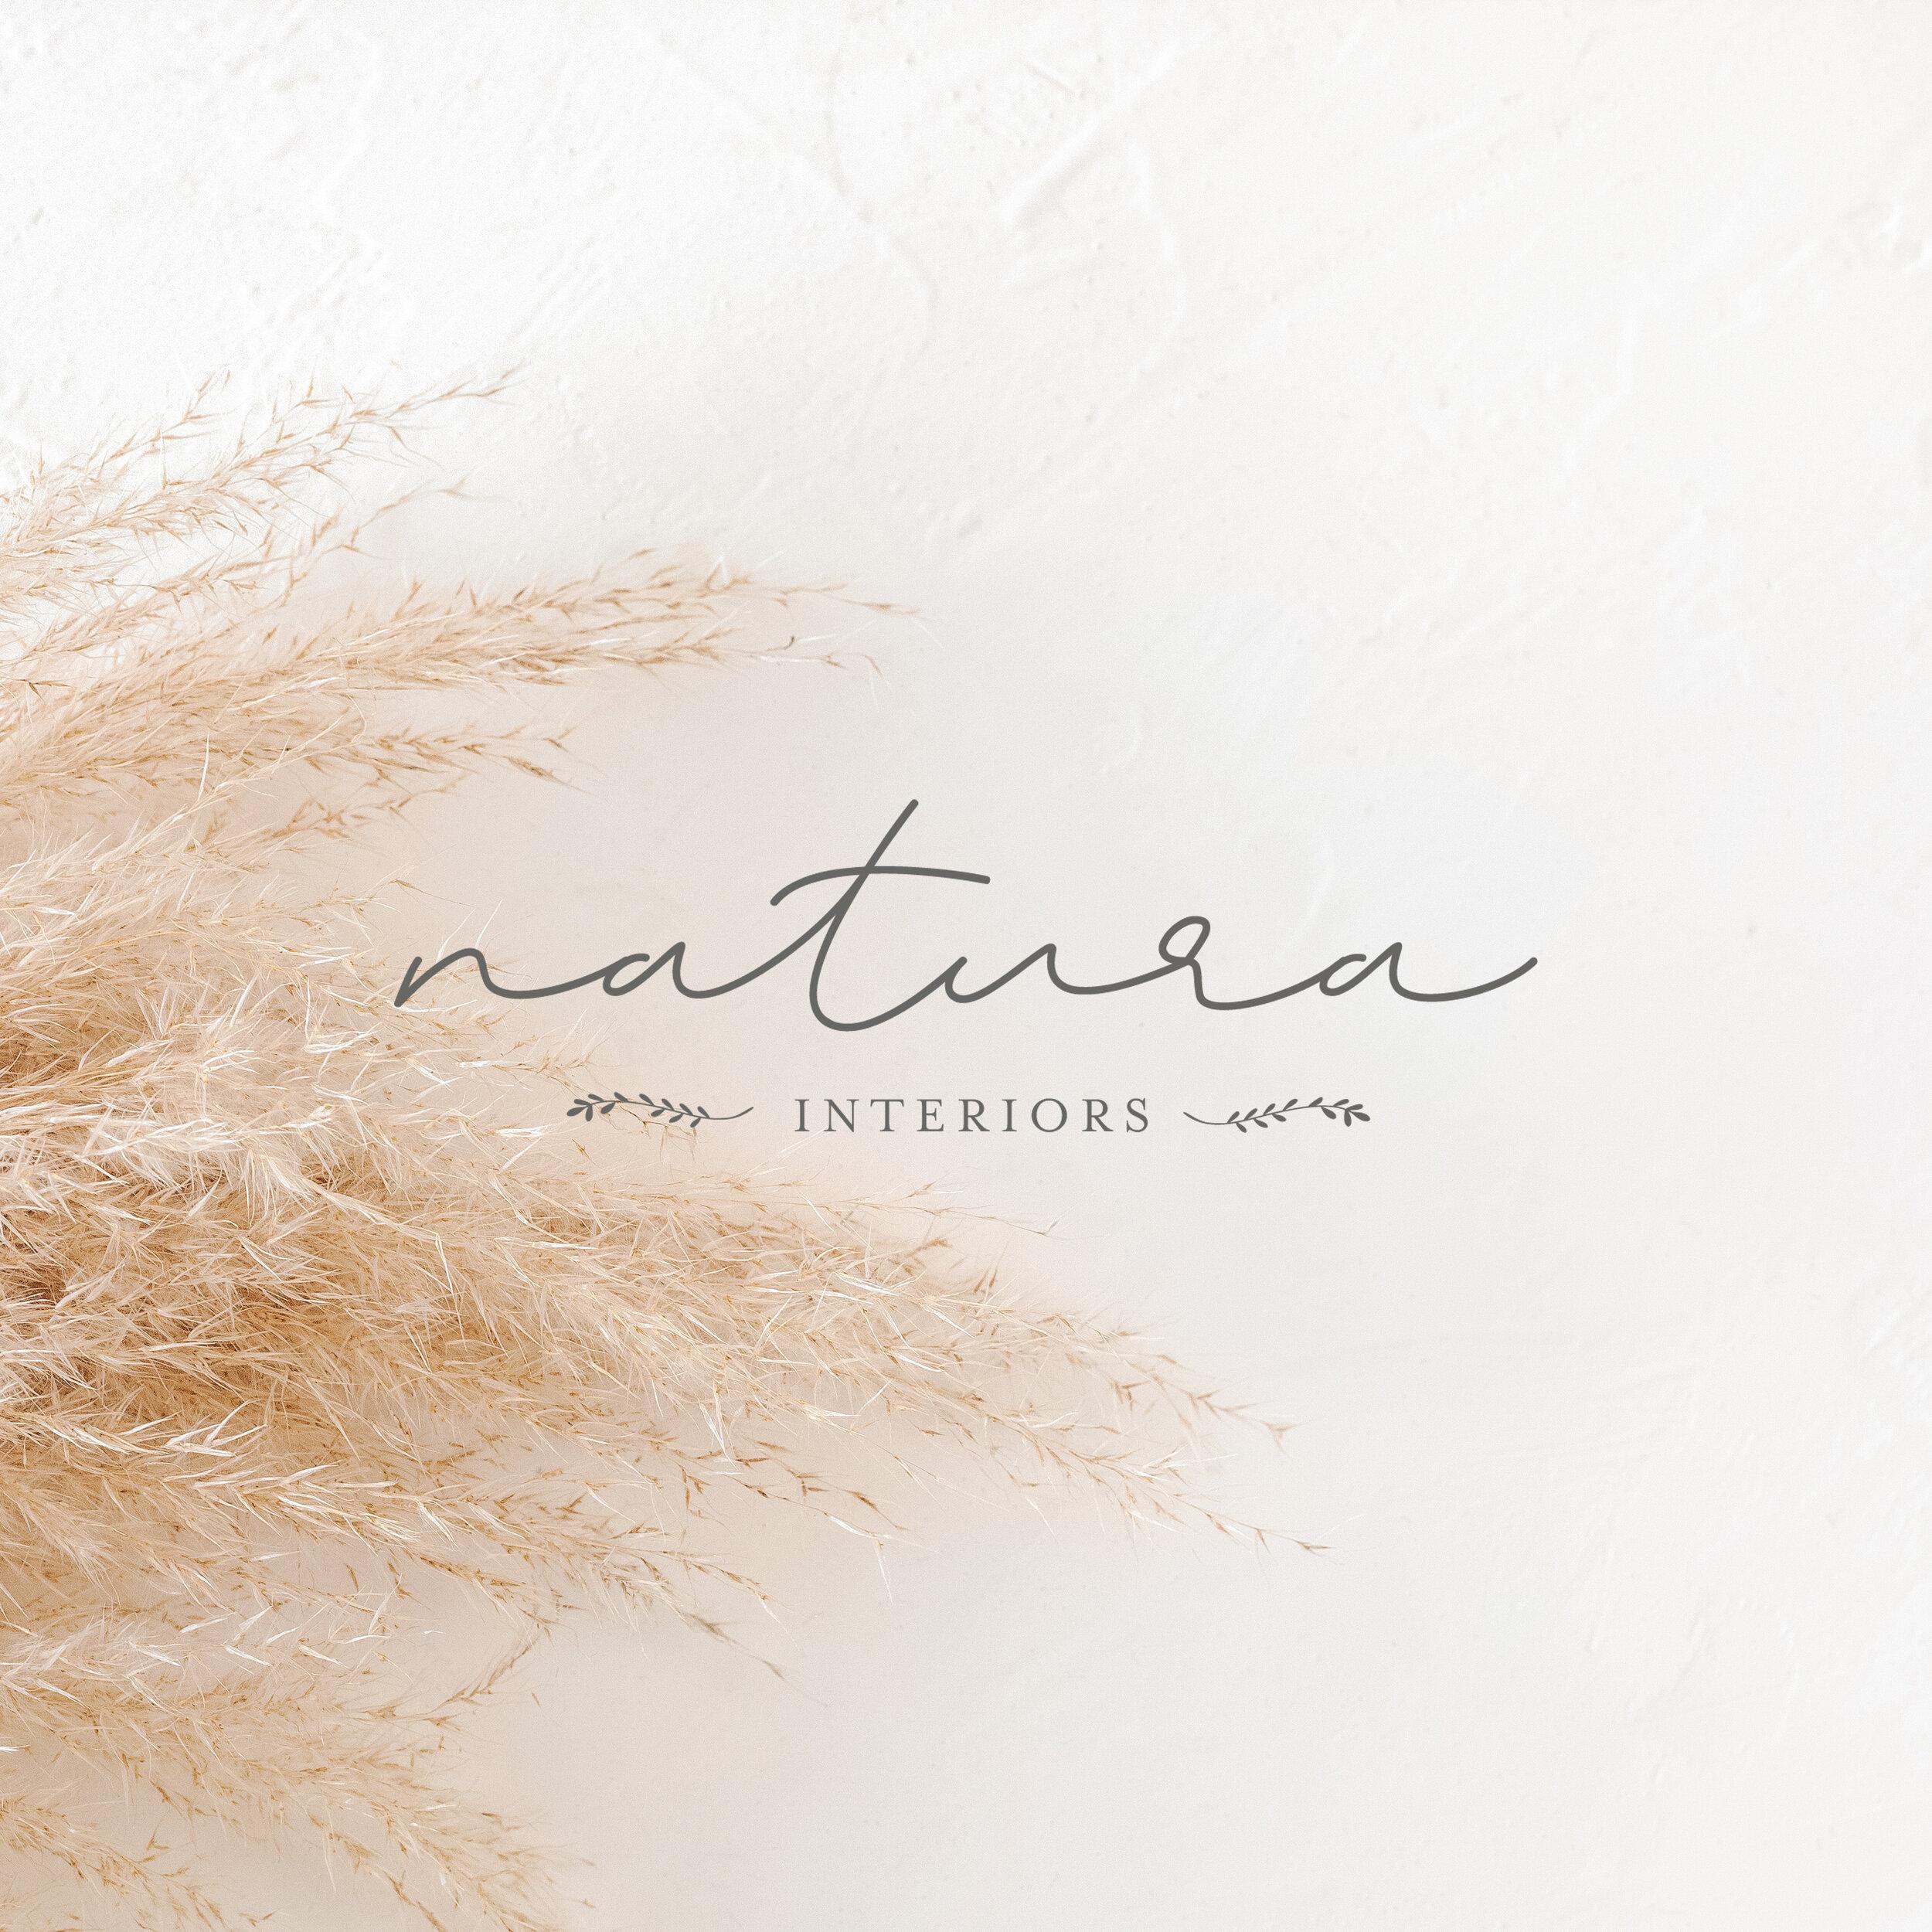 Natura Interiors   Branding by Jula Paper Co